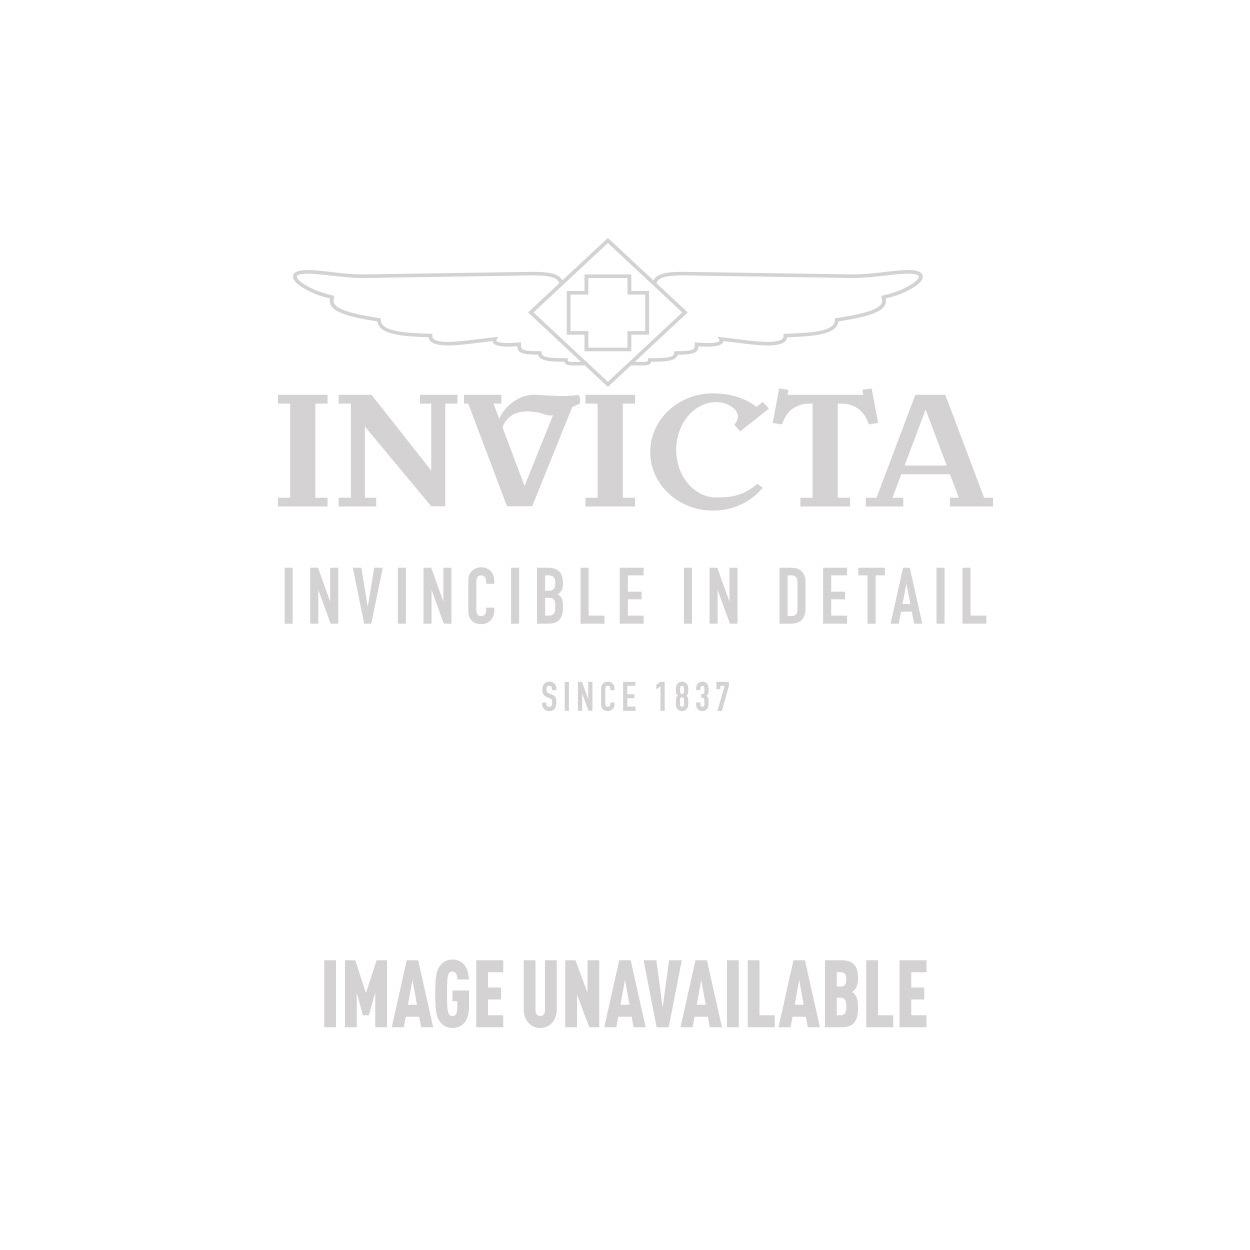 Invicta Aviator Quartz Watch - Gunmetal case with Grey tone Polyurethane band - Model 19678